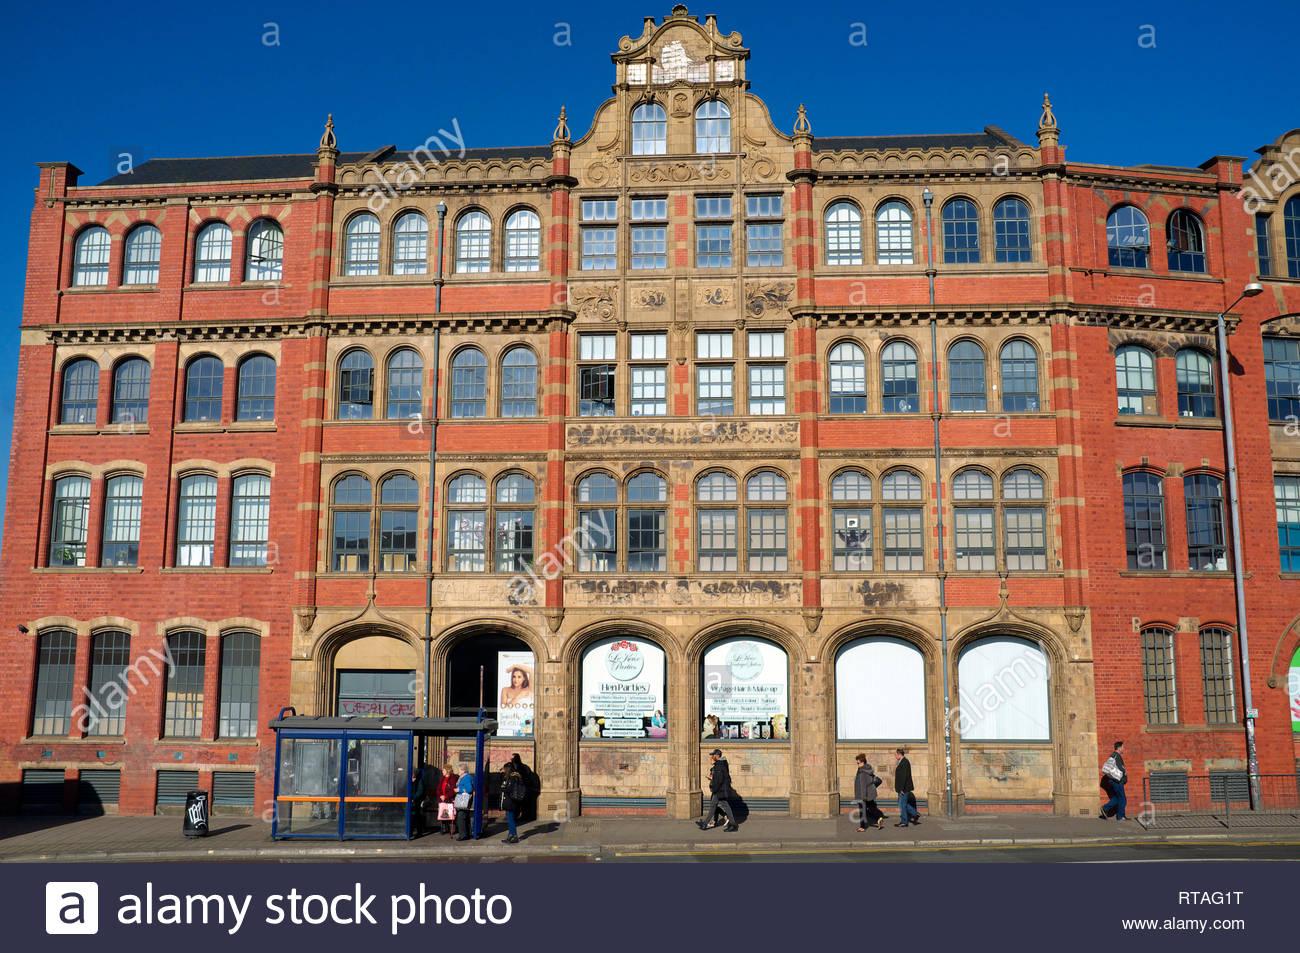 Devonshire Works (former Bird's custard factory), in Digbeth, central Birmingham, West Midlands, UK. Stock Photo